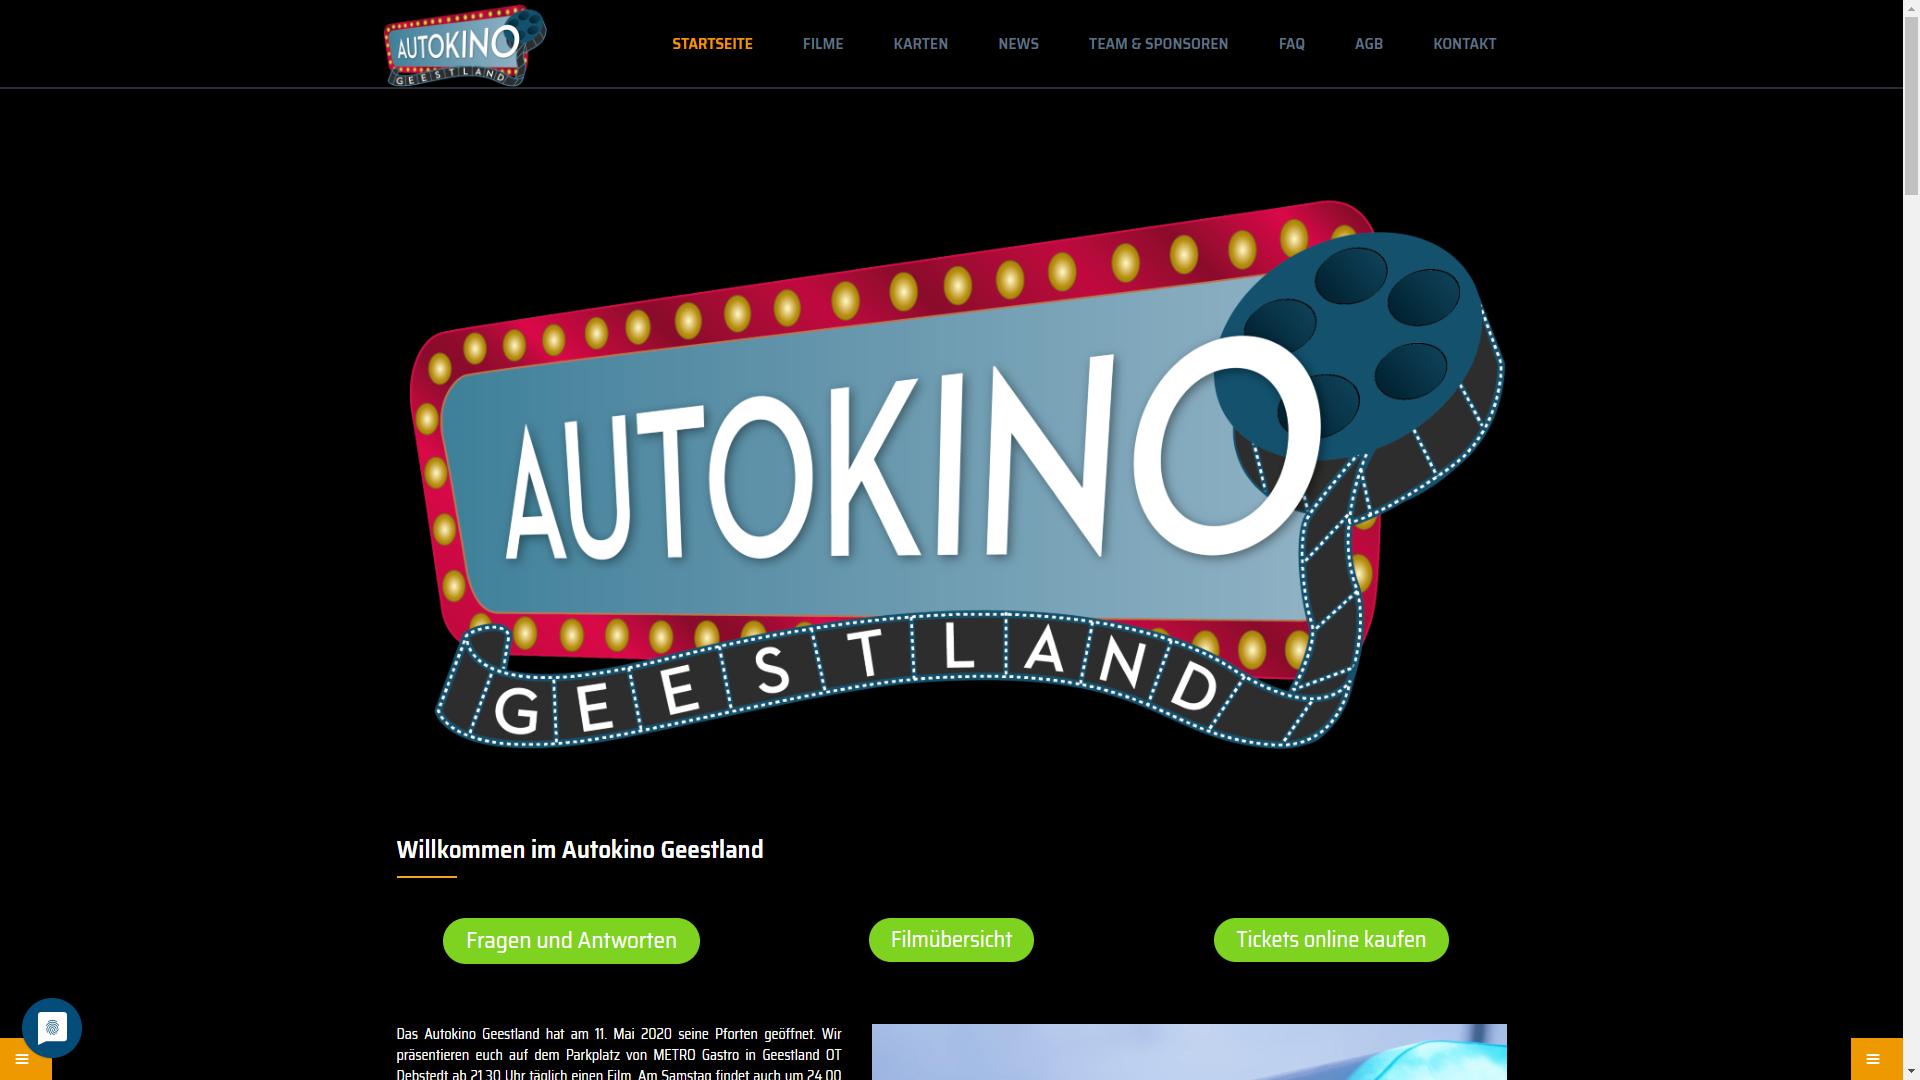 Event - Autokino Geestland